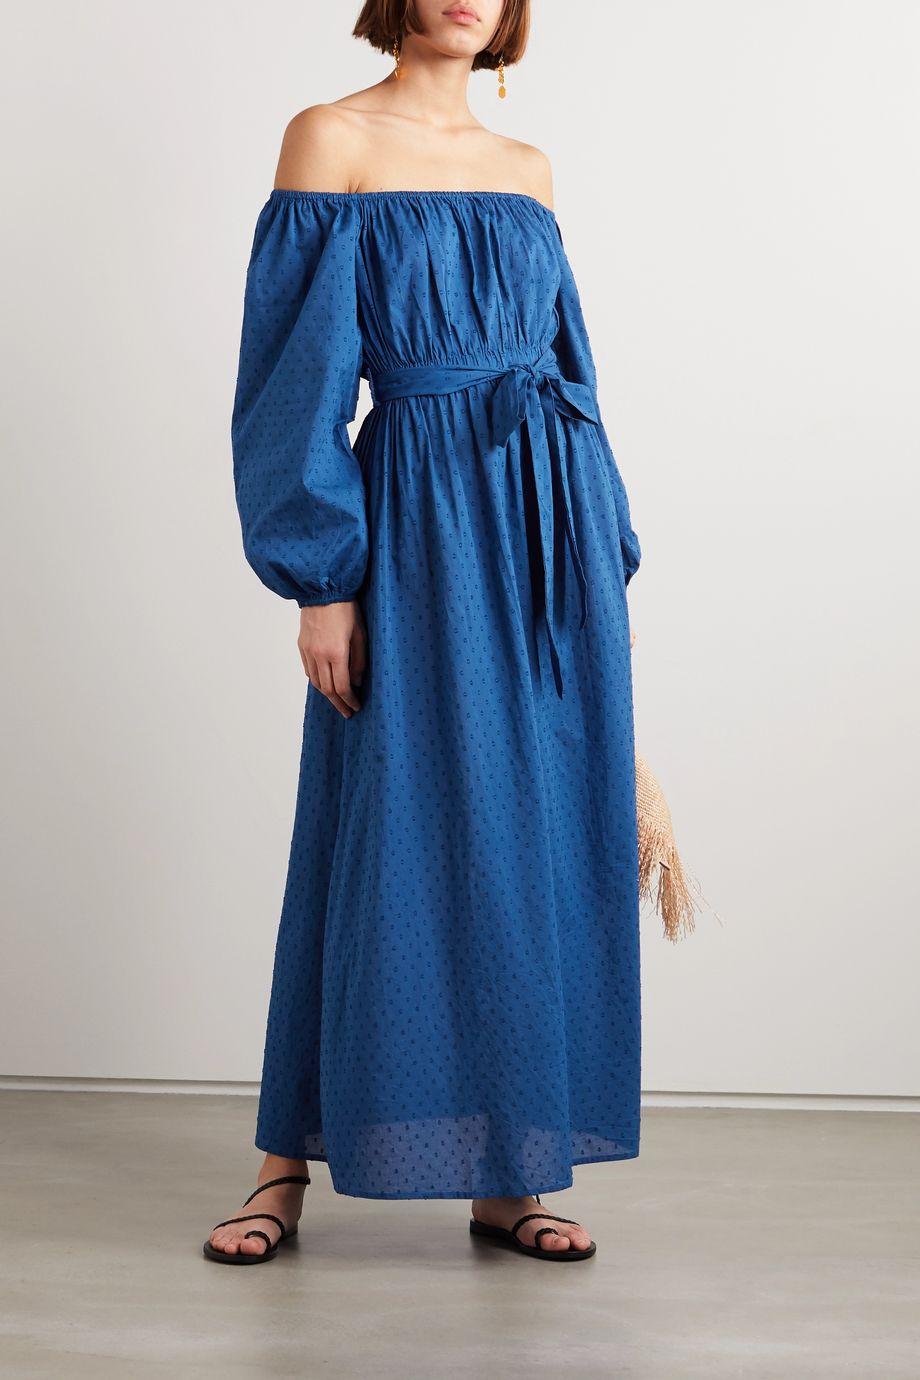 Mara Hoffman + NET SUSTAIN Malika off-the-shoulder fil coupé organic cotton maxi dress